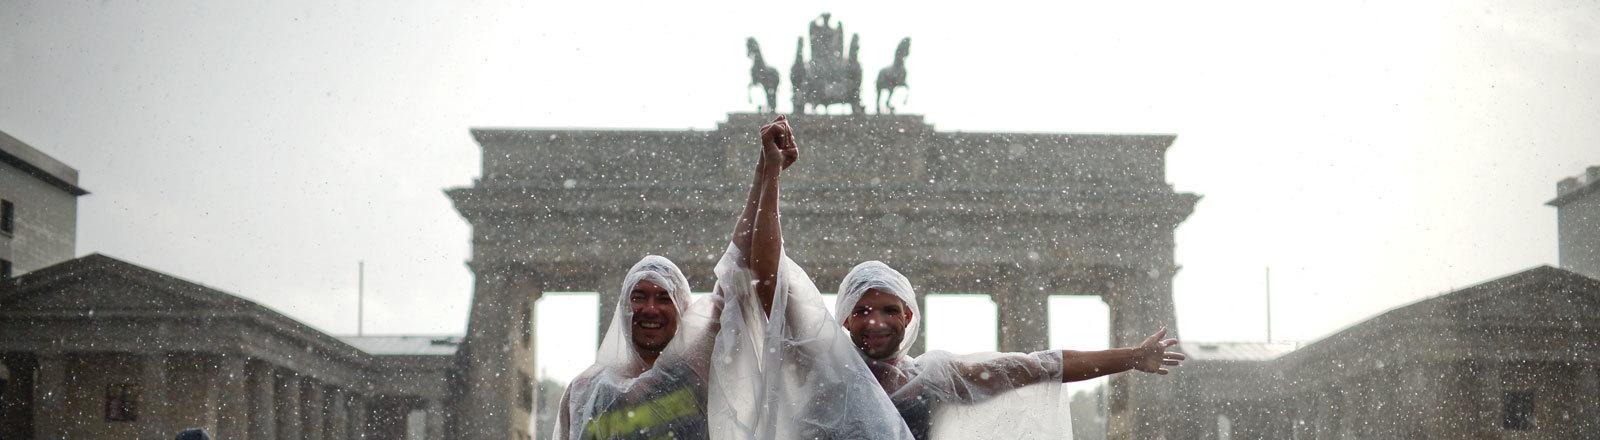 Zwei Männer vorm Brandenburger Tor